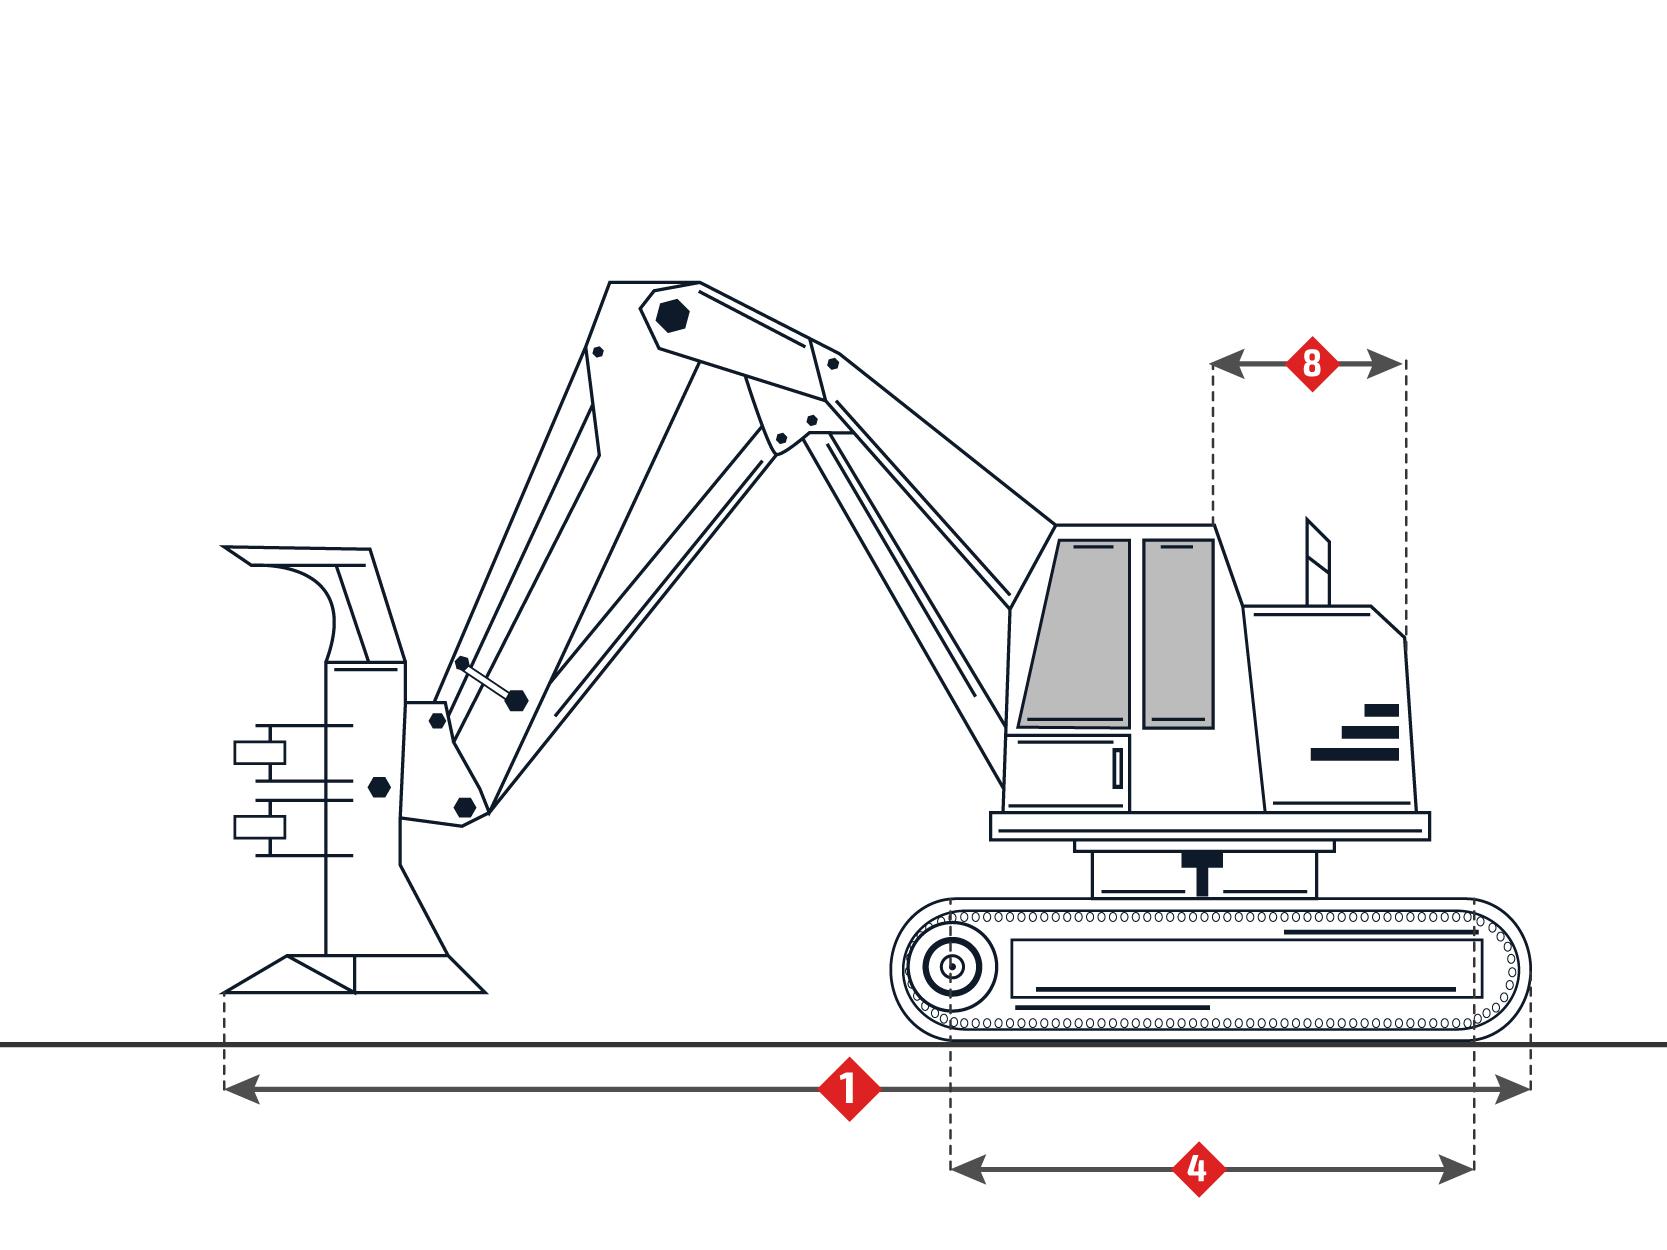 John Deere 959j Specifications Felling And Bunching Machine